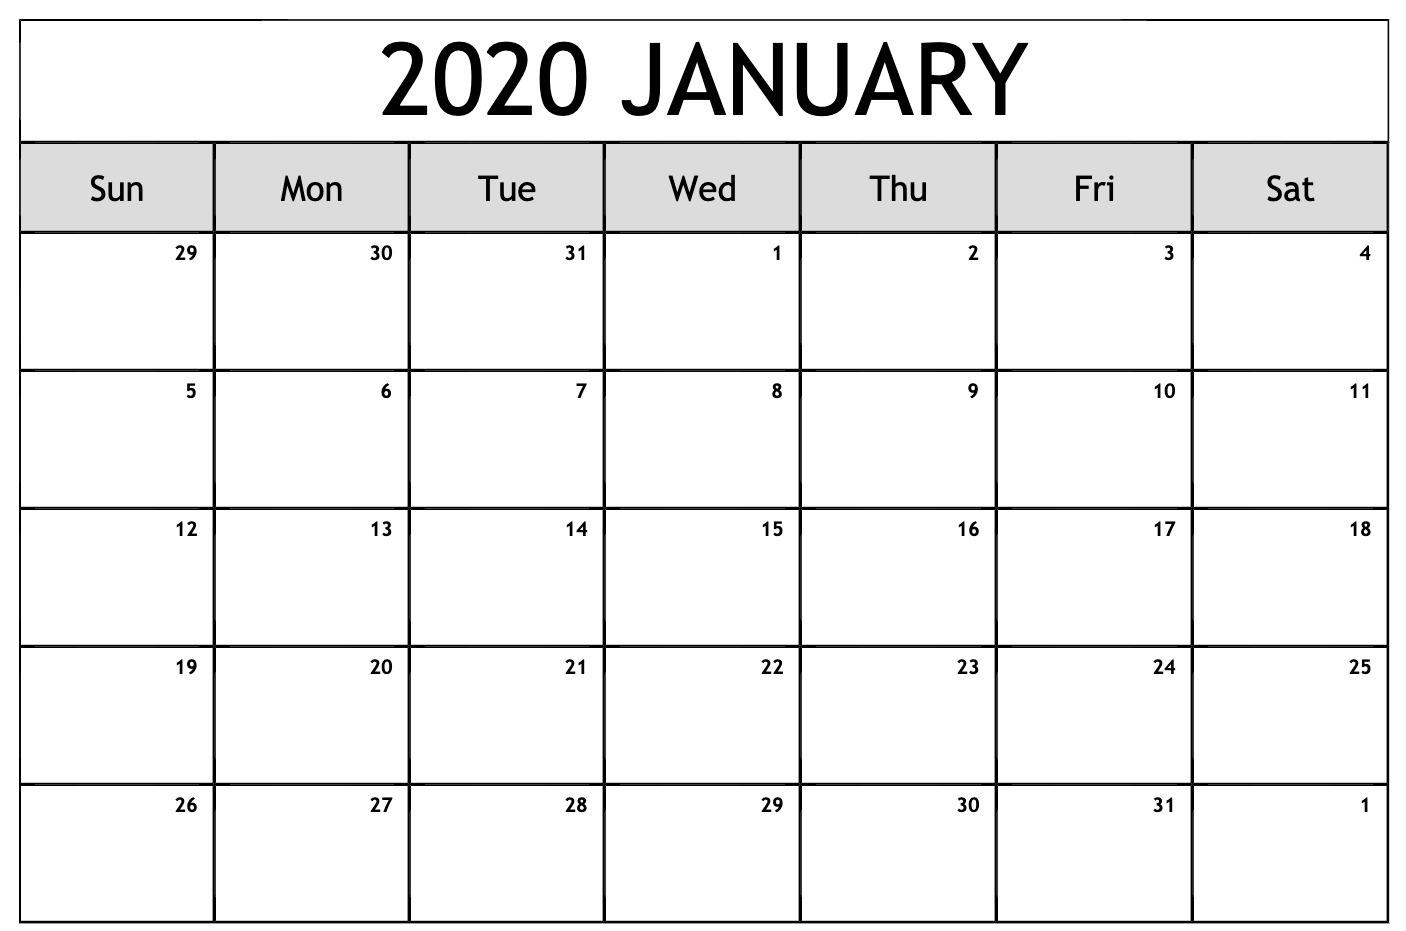 Free Editable January Calendar 2020 Blank Template Exceptional Microsoft Word Printable Calendar 2020